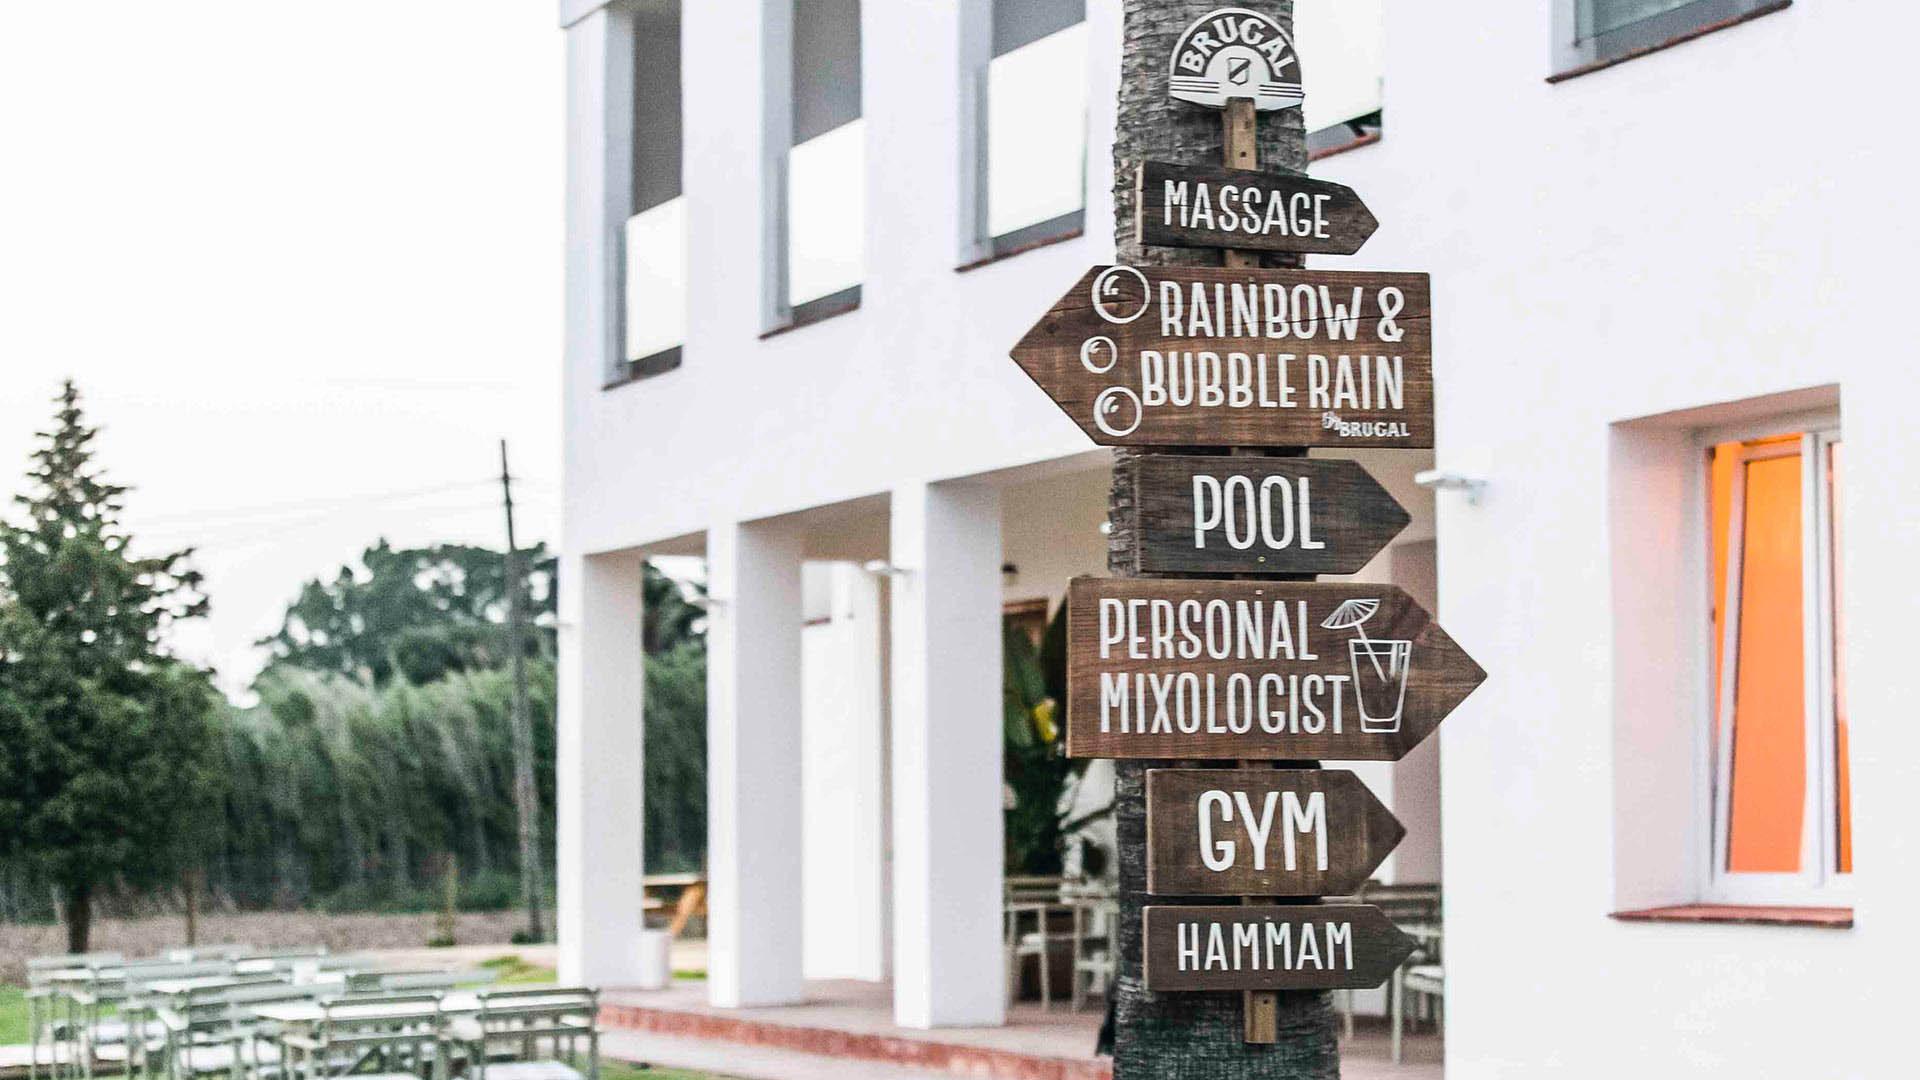 Ocean tarifa by brugal event wood signage design